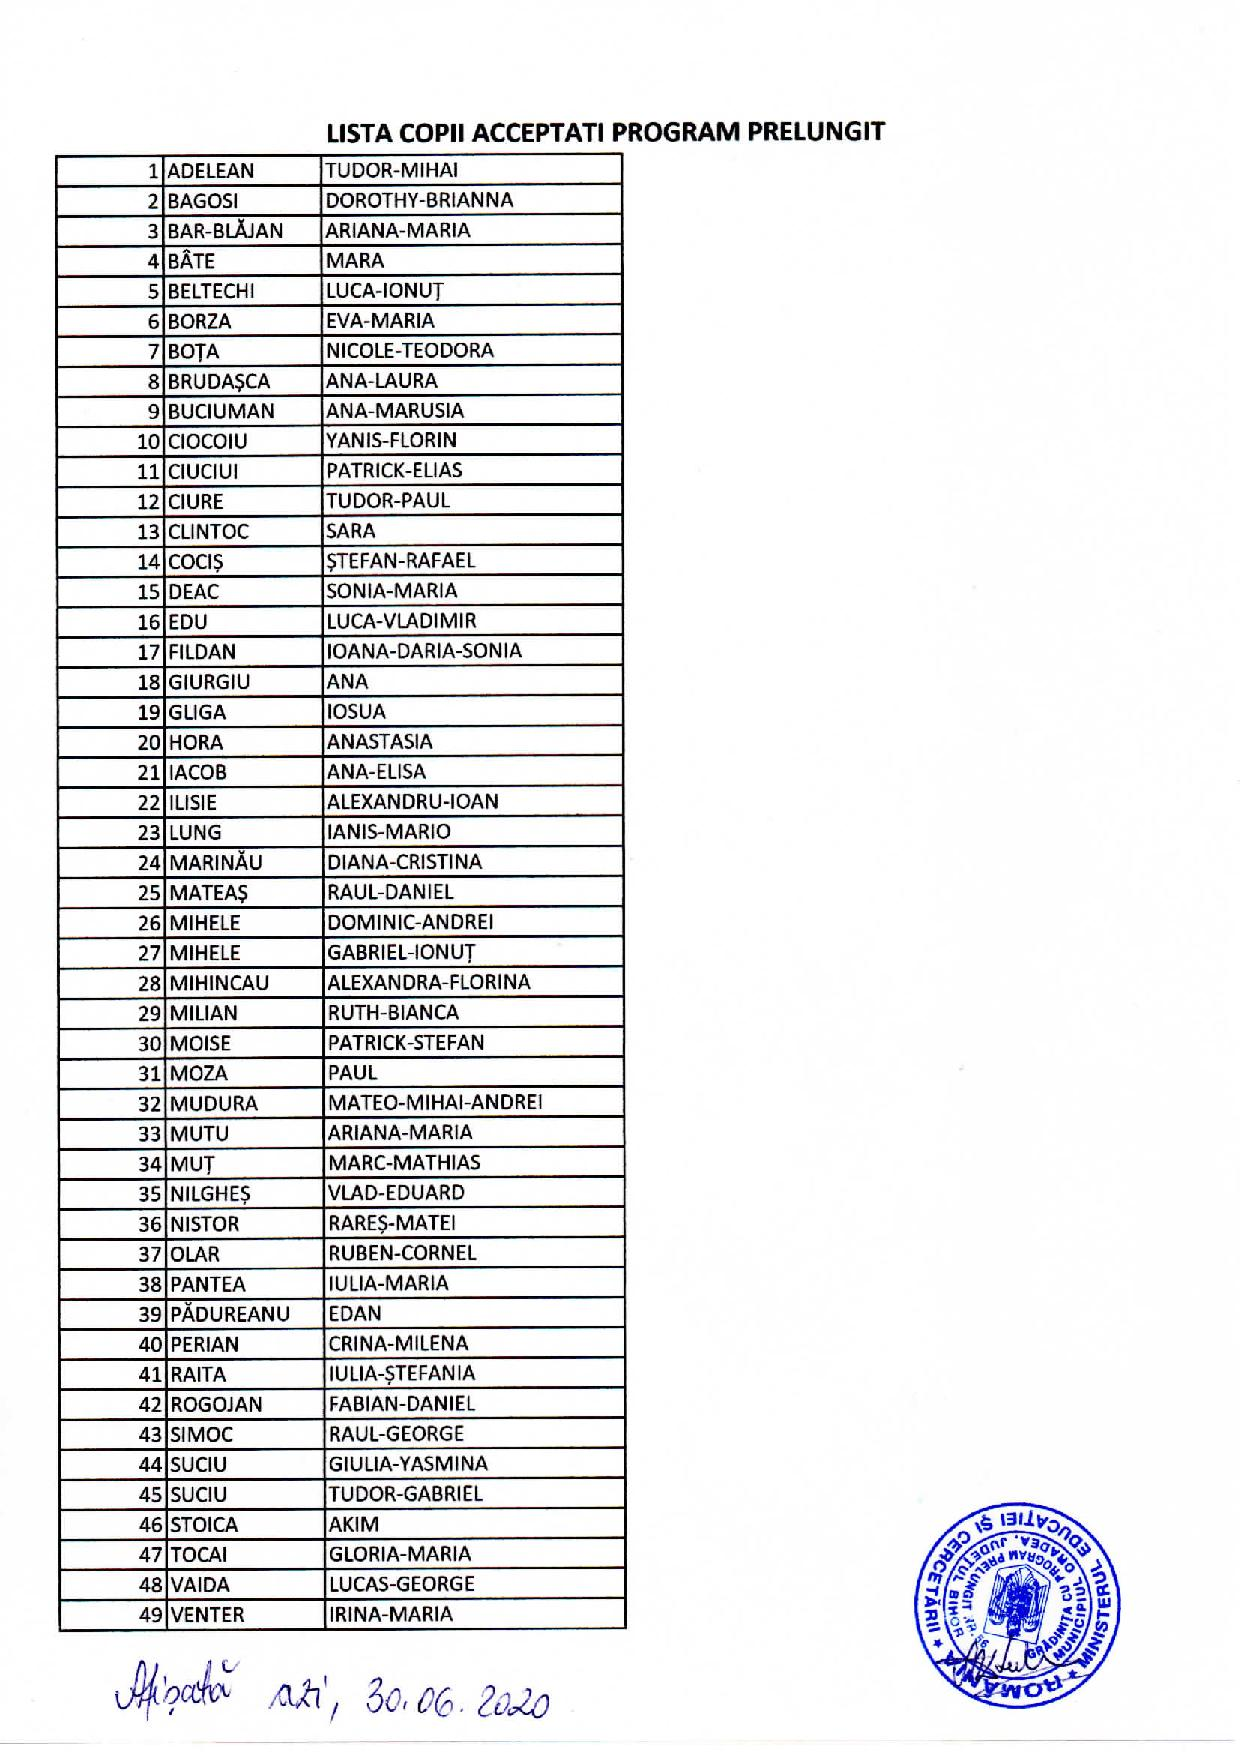 lista copii acceptati program prelungit-page-001